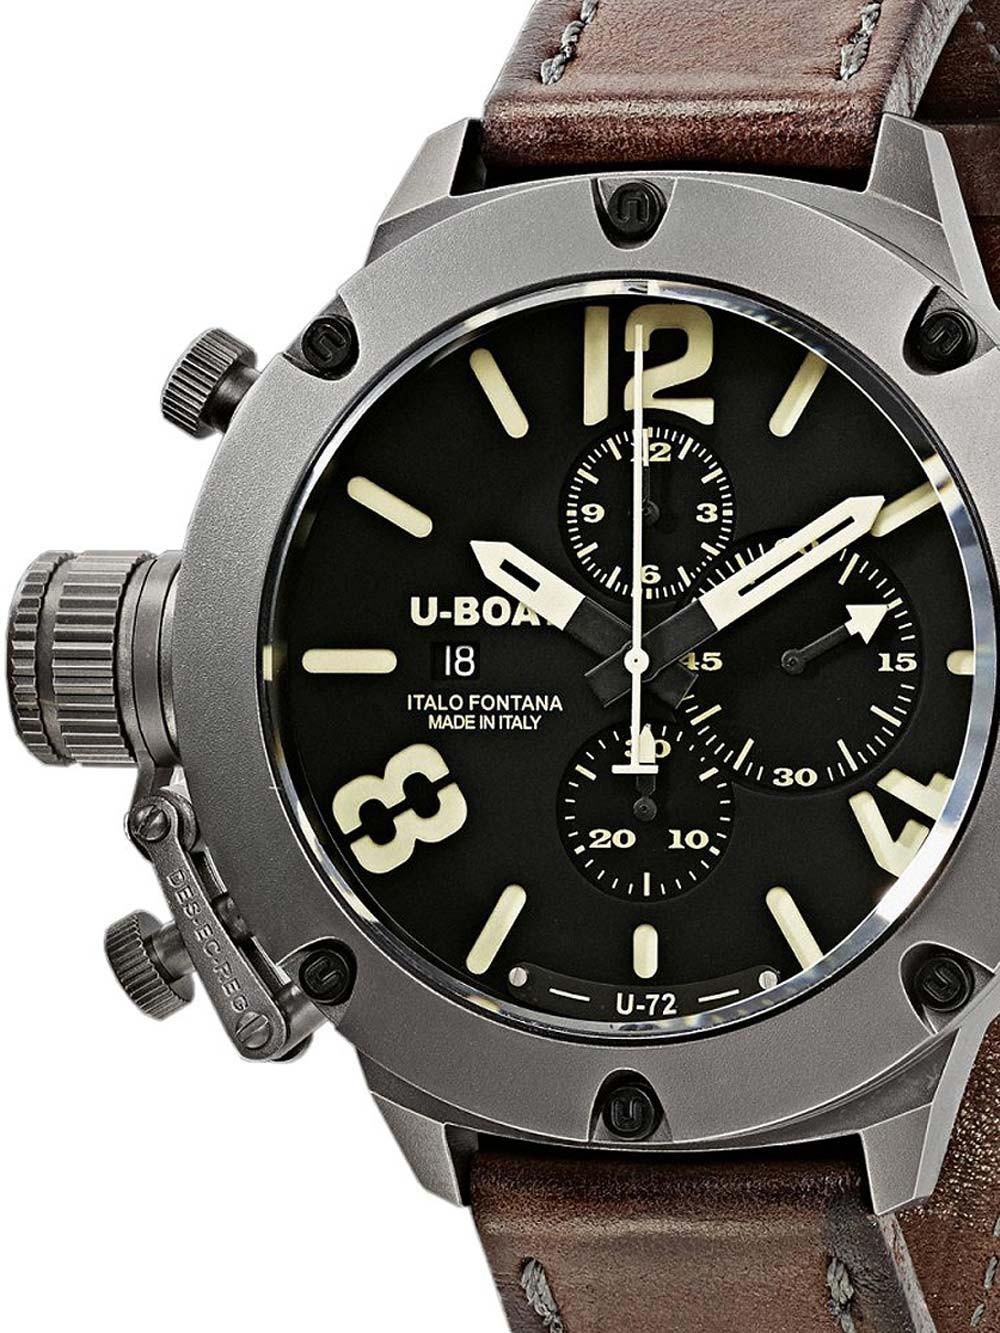 ceas barbatesc u-boat 6549/t classico 53mm titan autom. cronograf 200m